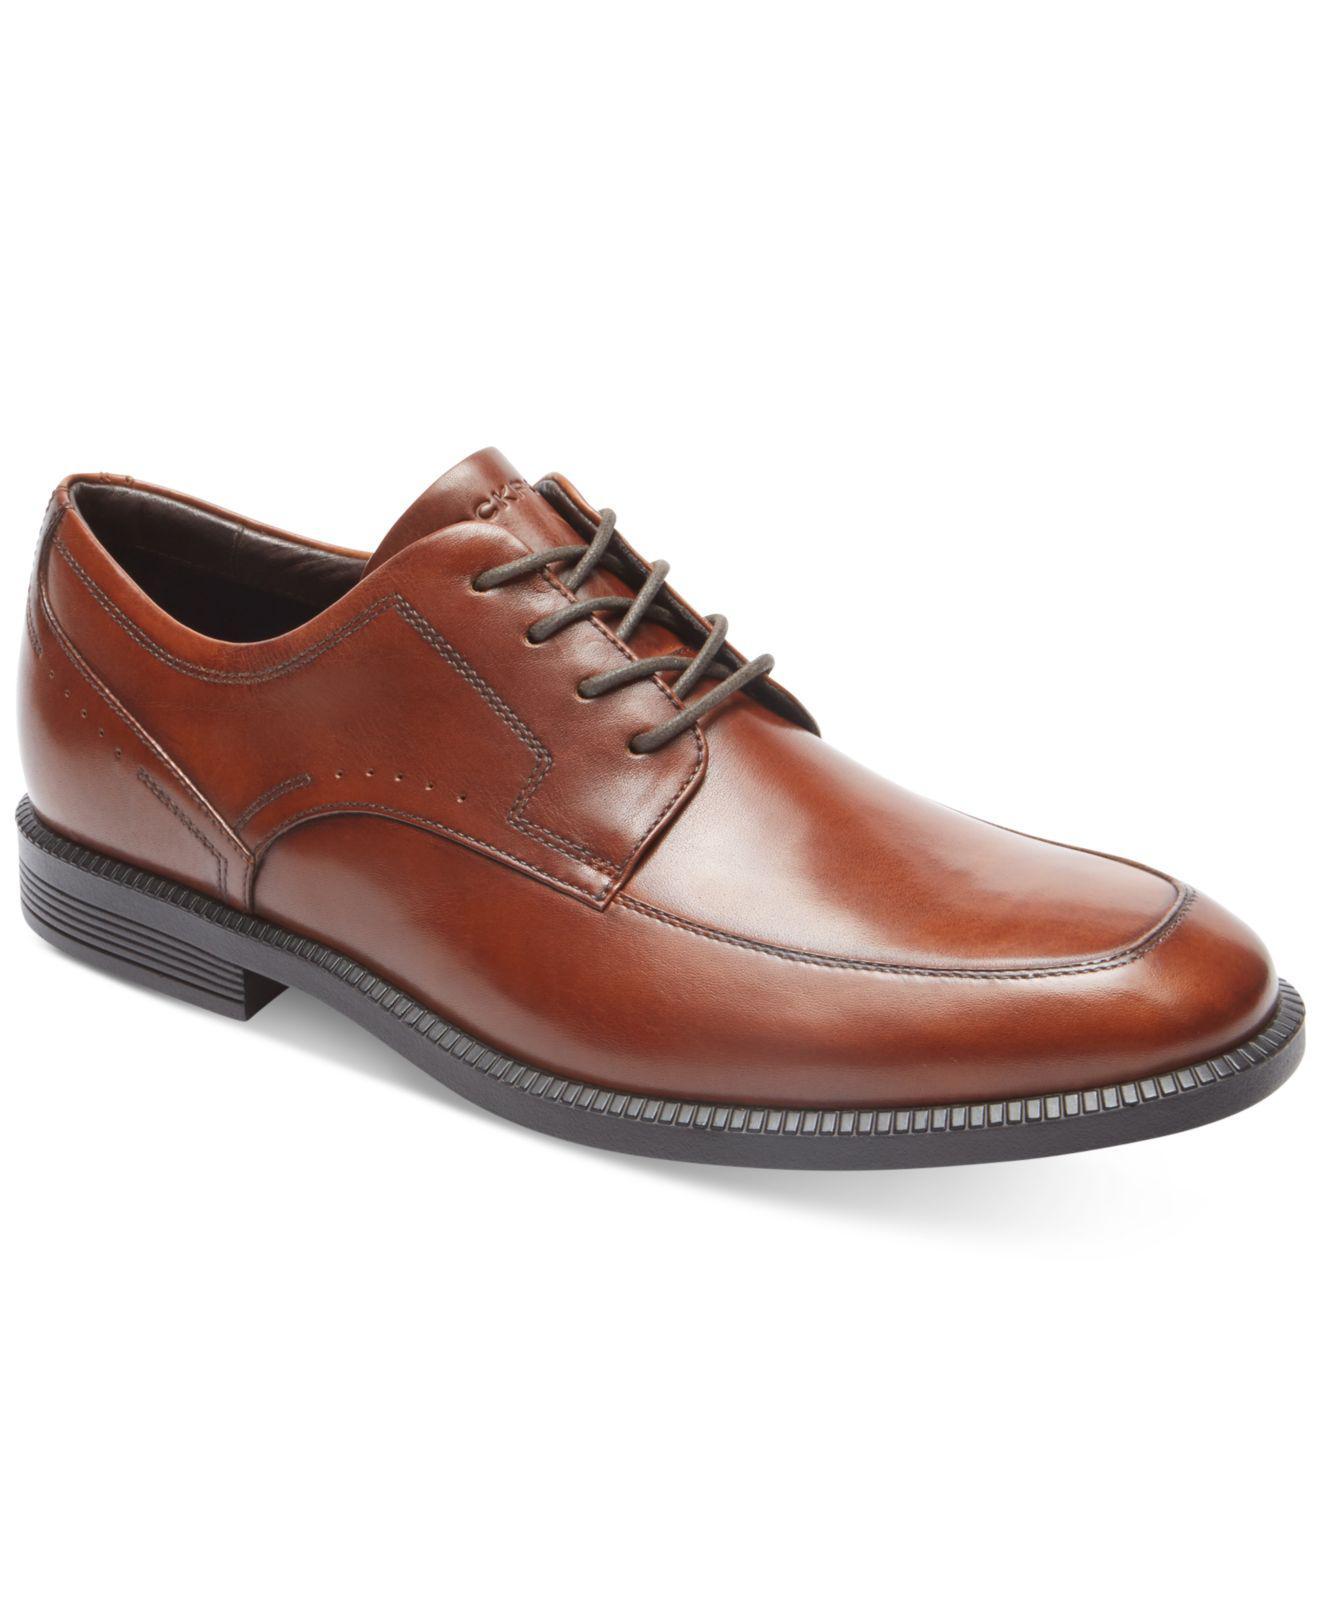 Macys New York Mens Shoes Rockport